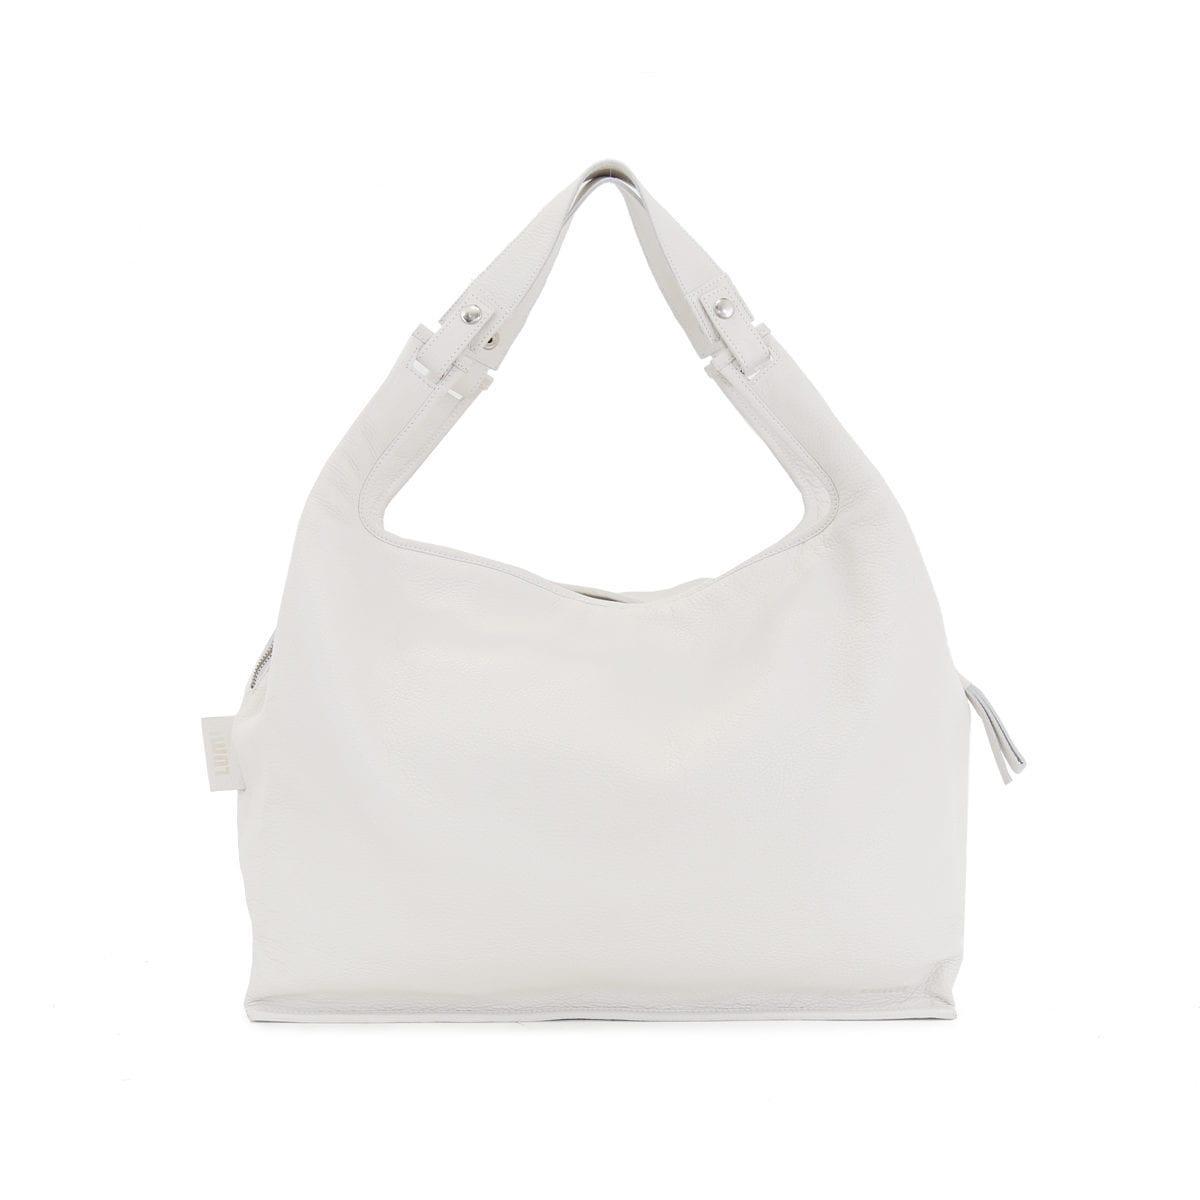 LUMI XXL Supermarket Bag in Ice White